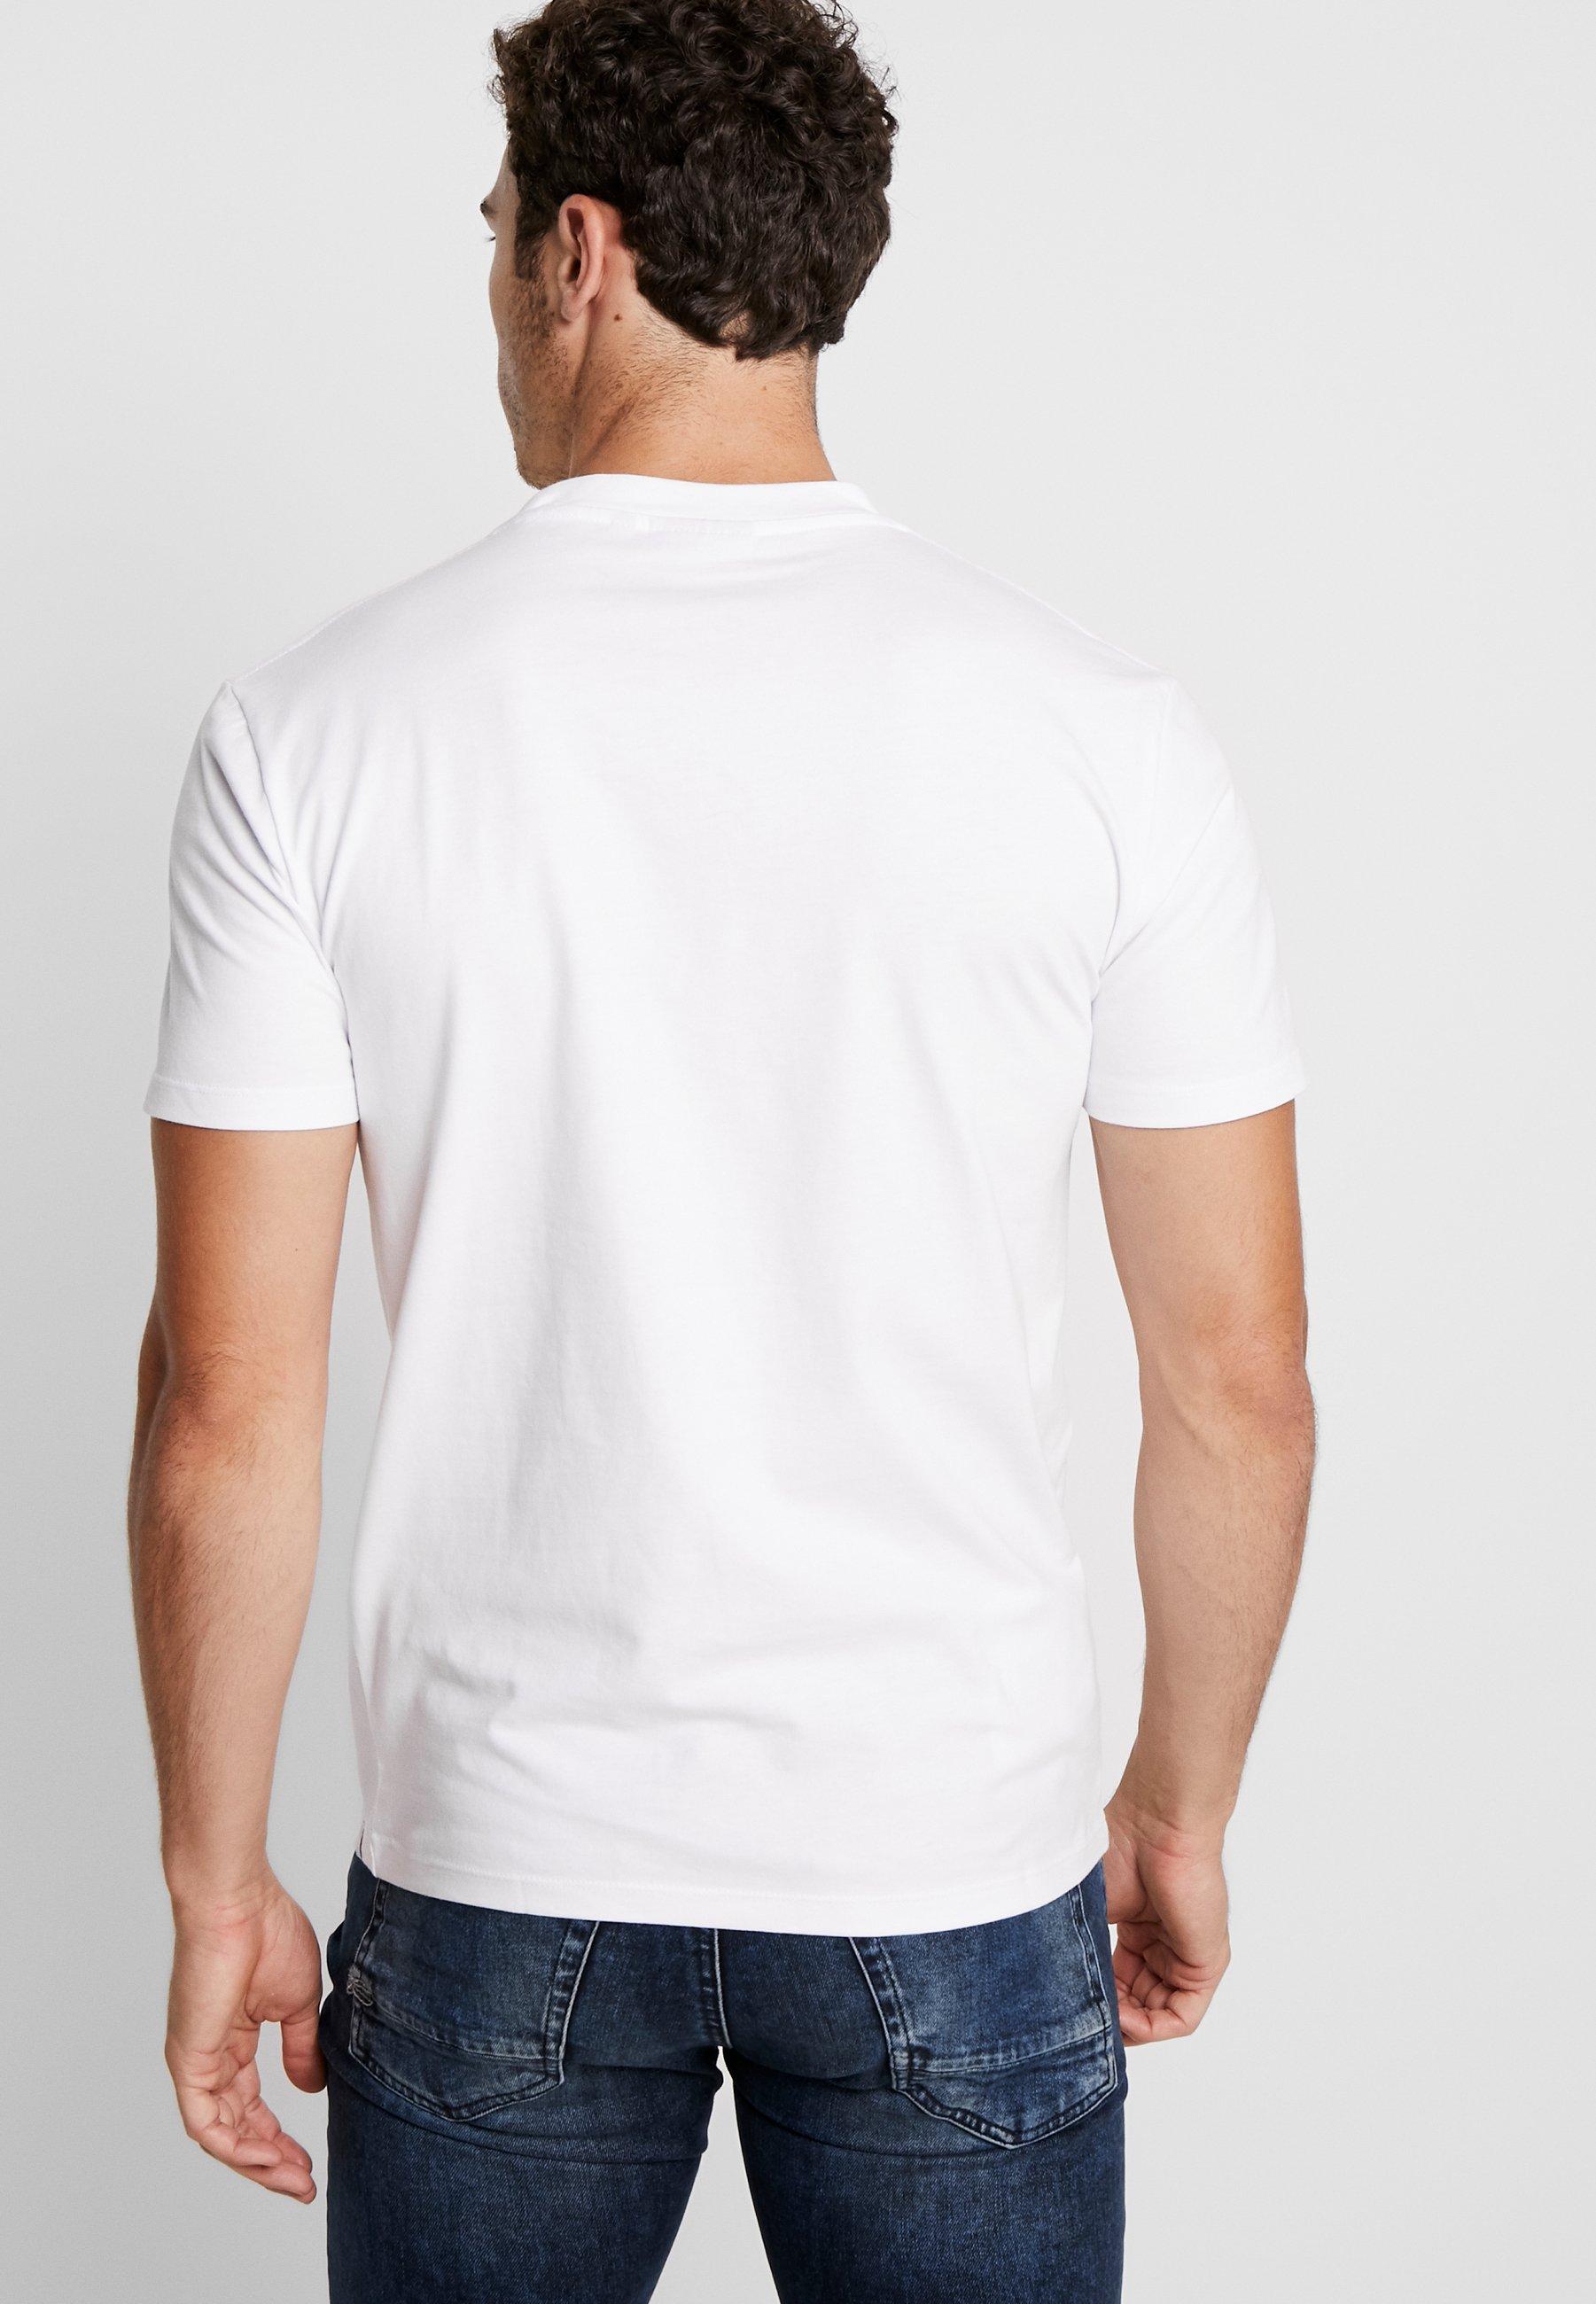 White Minimum shirt White Minimum Minimum AarhusT AarhusT Basique Basique AarhusT shirt On0Nv8wm